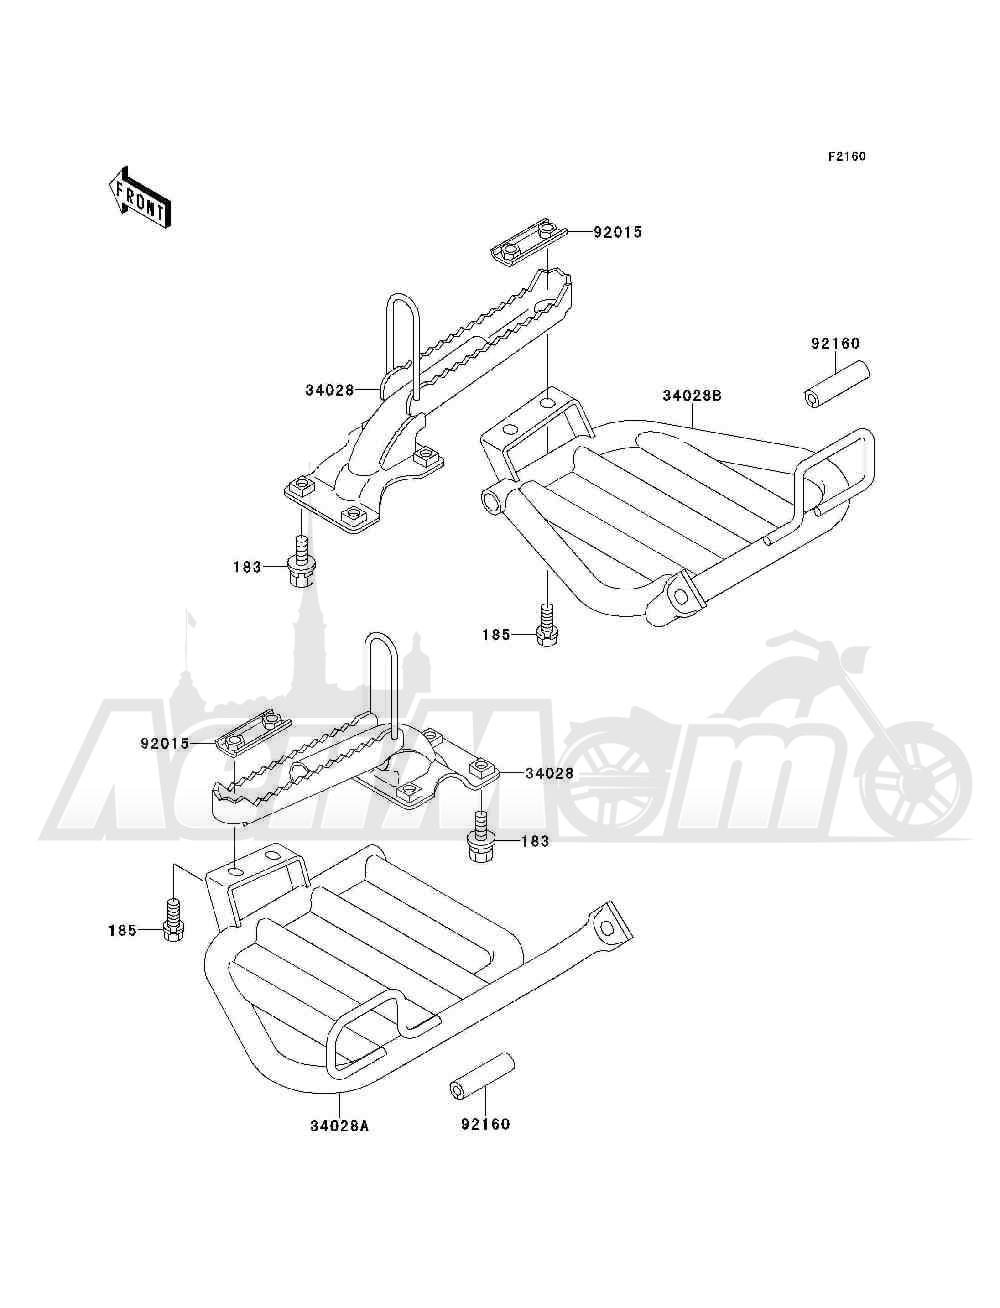 Запчасти для Квадроцикла Kawasaki 1993 BAYOU 300 4X4 (KLF300-C5) Раздел: FOOTRESTS | подножки